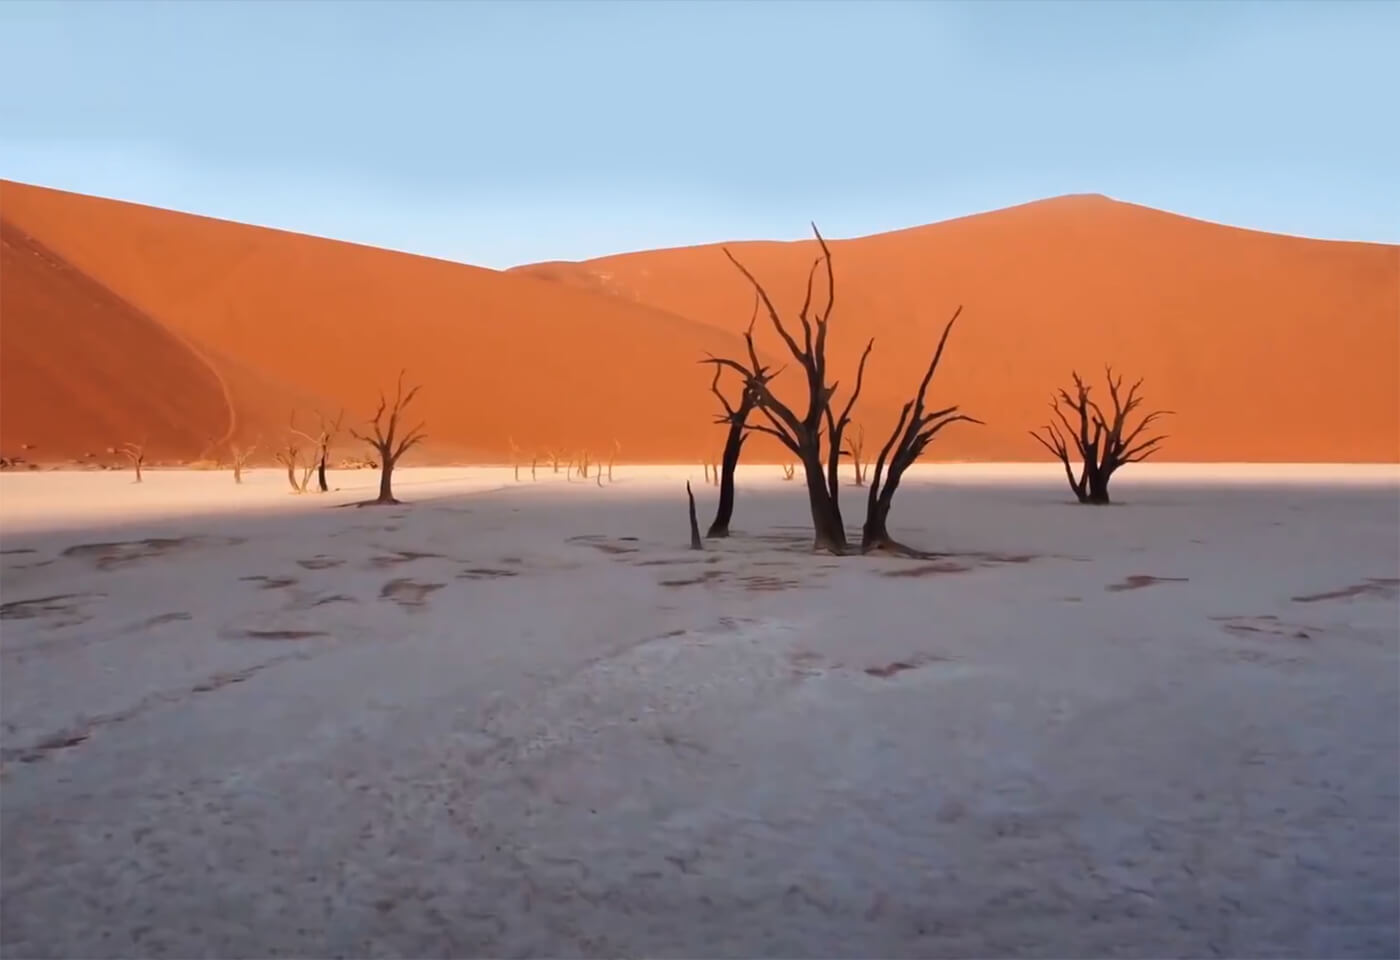 Landscape image of desert